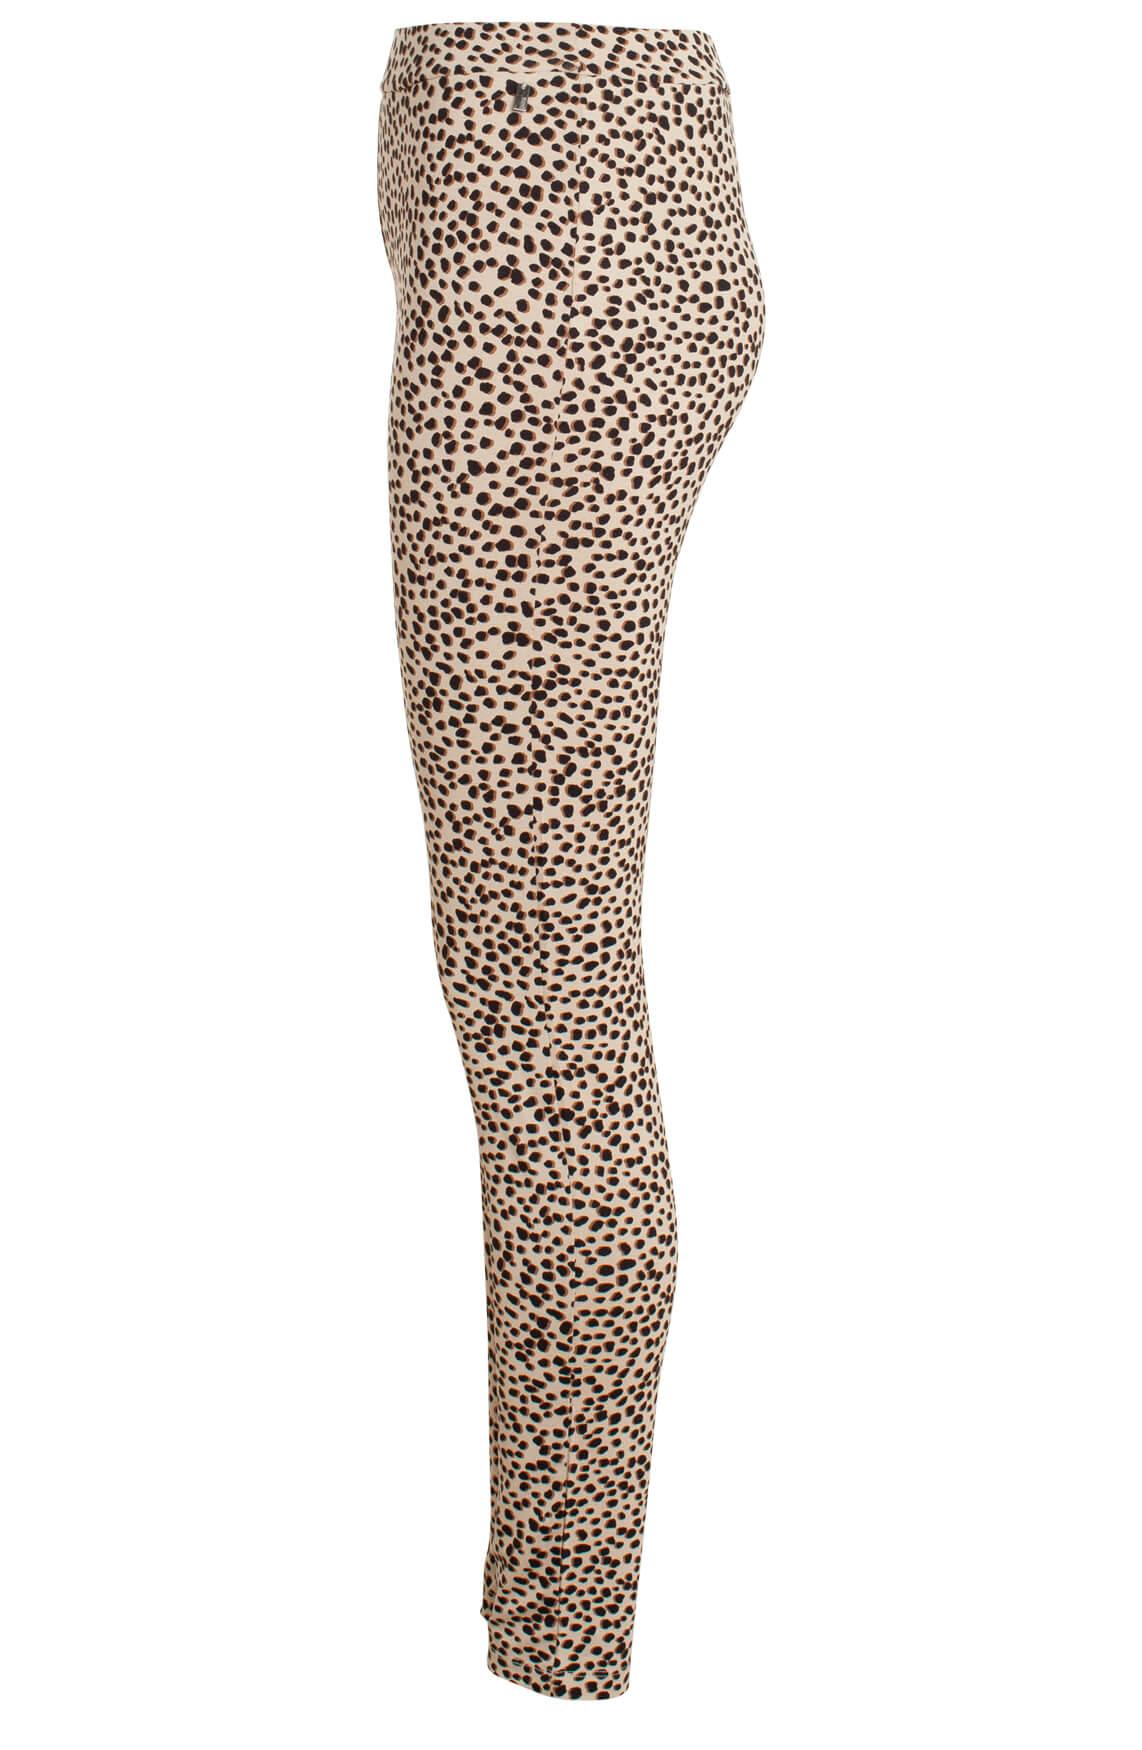 Anna Dames Legging met animalprint Bruin